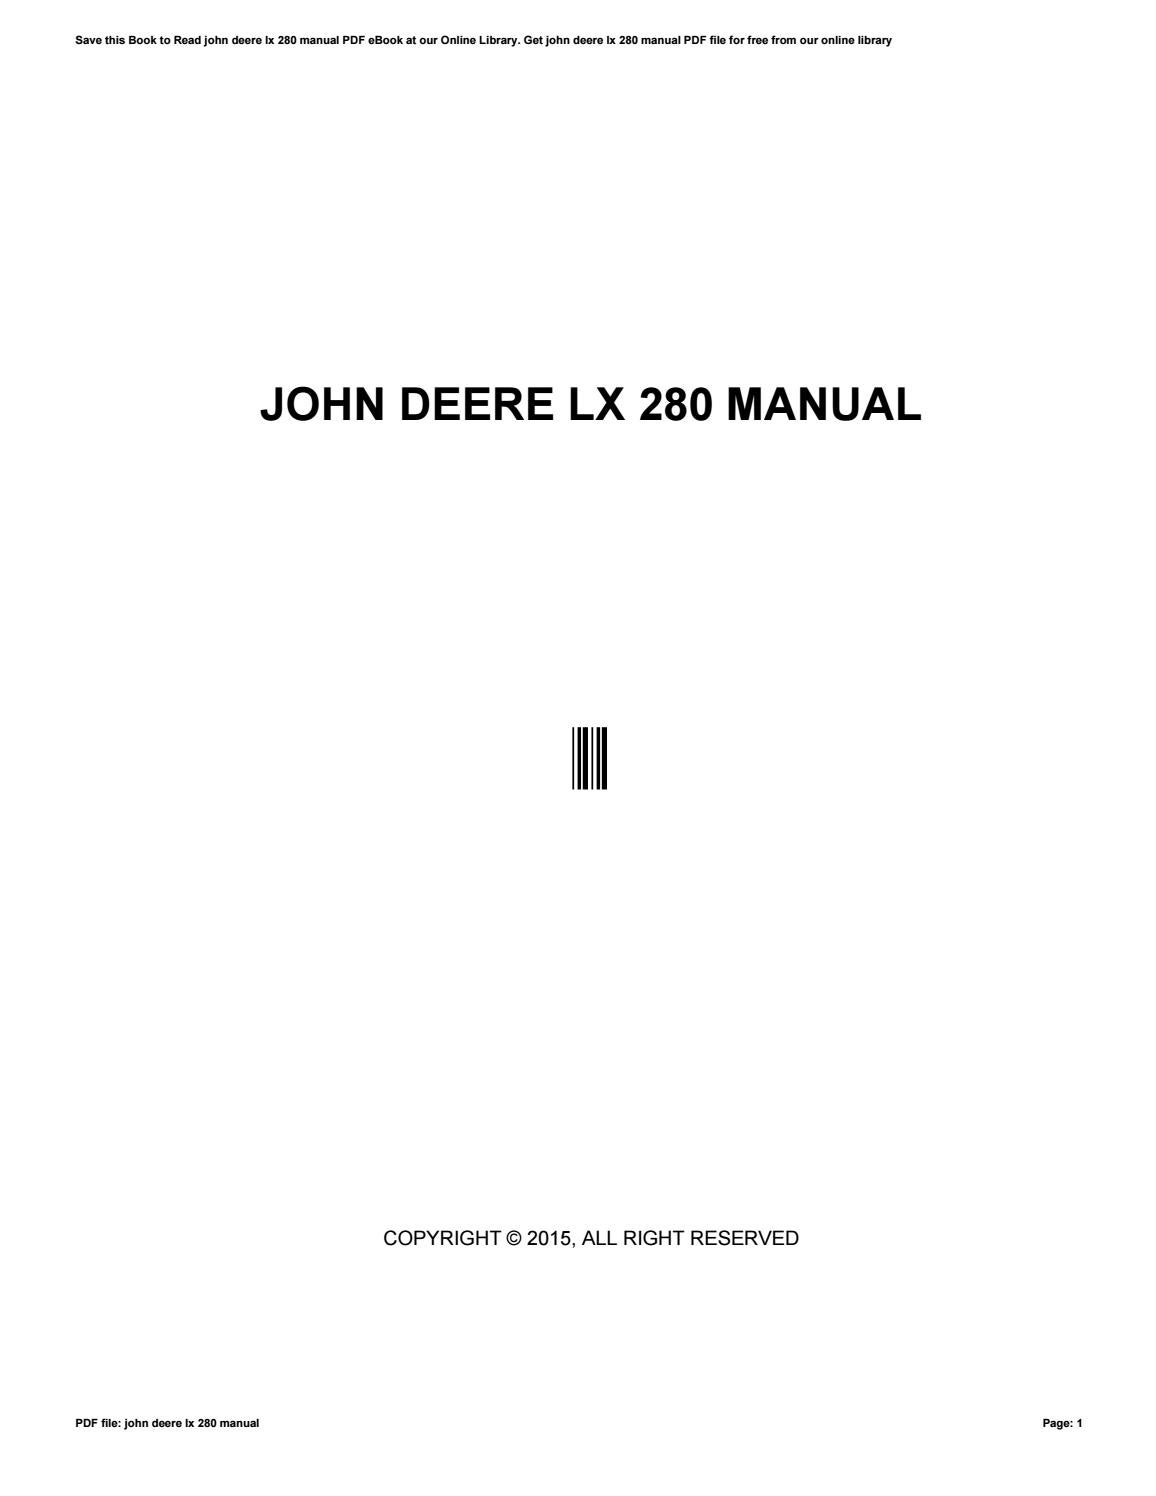 hight resolution of john deere lx 280 manual by c8163 issuu